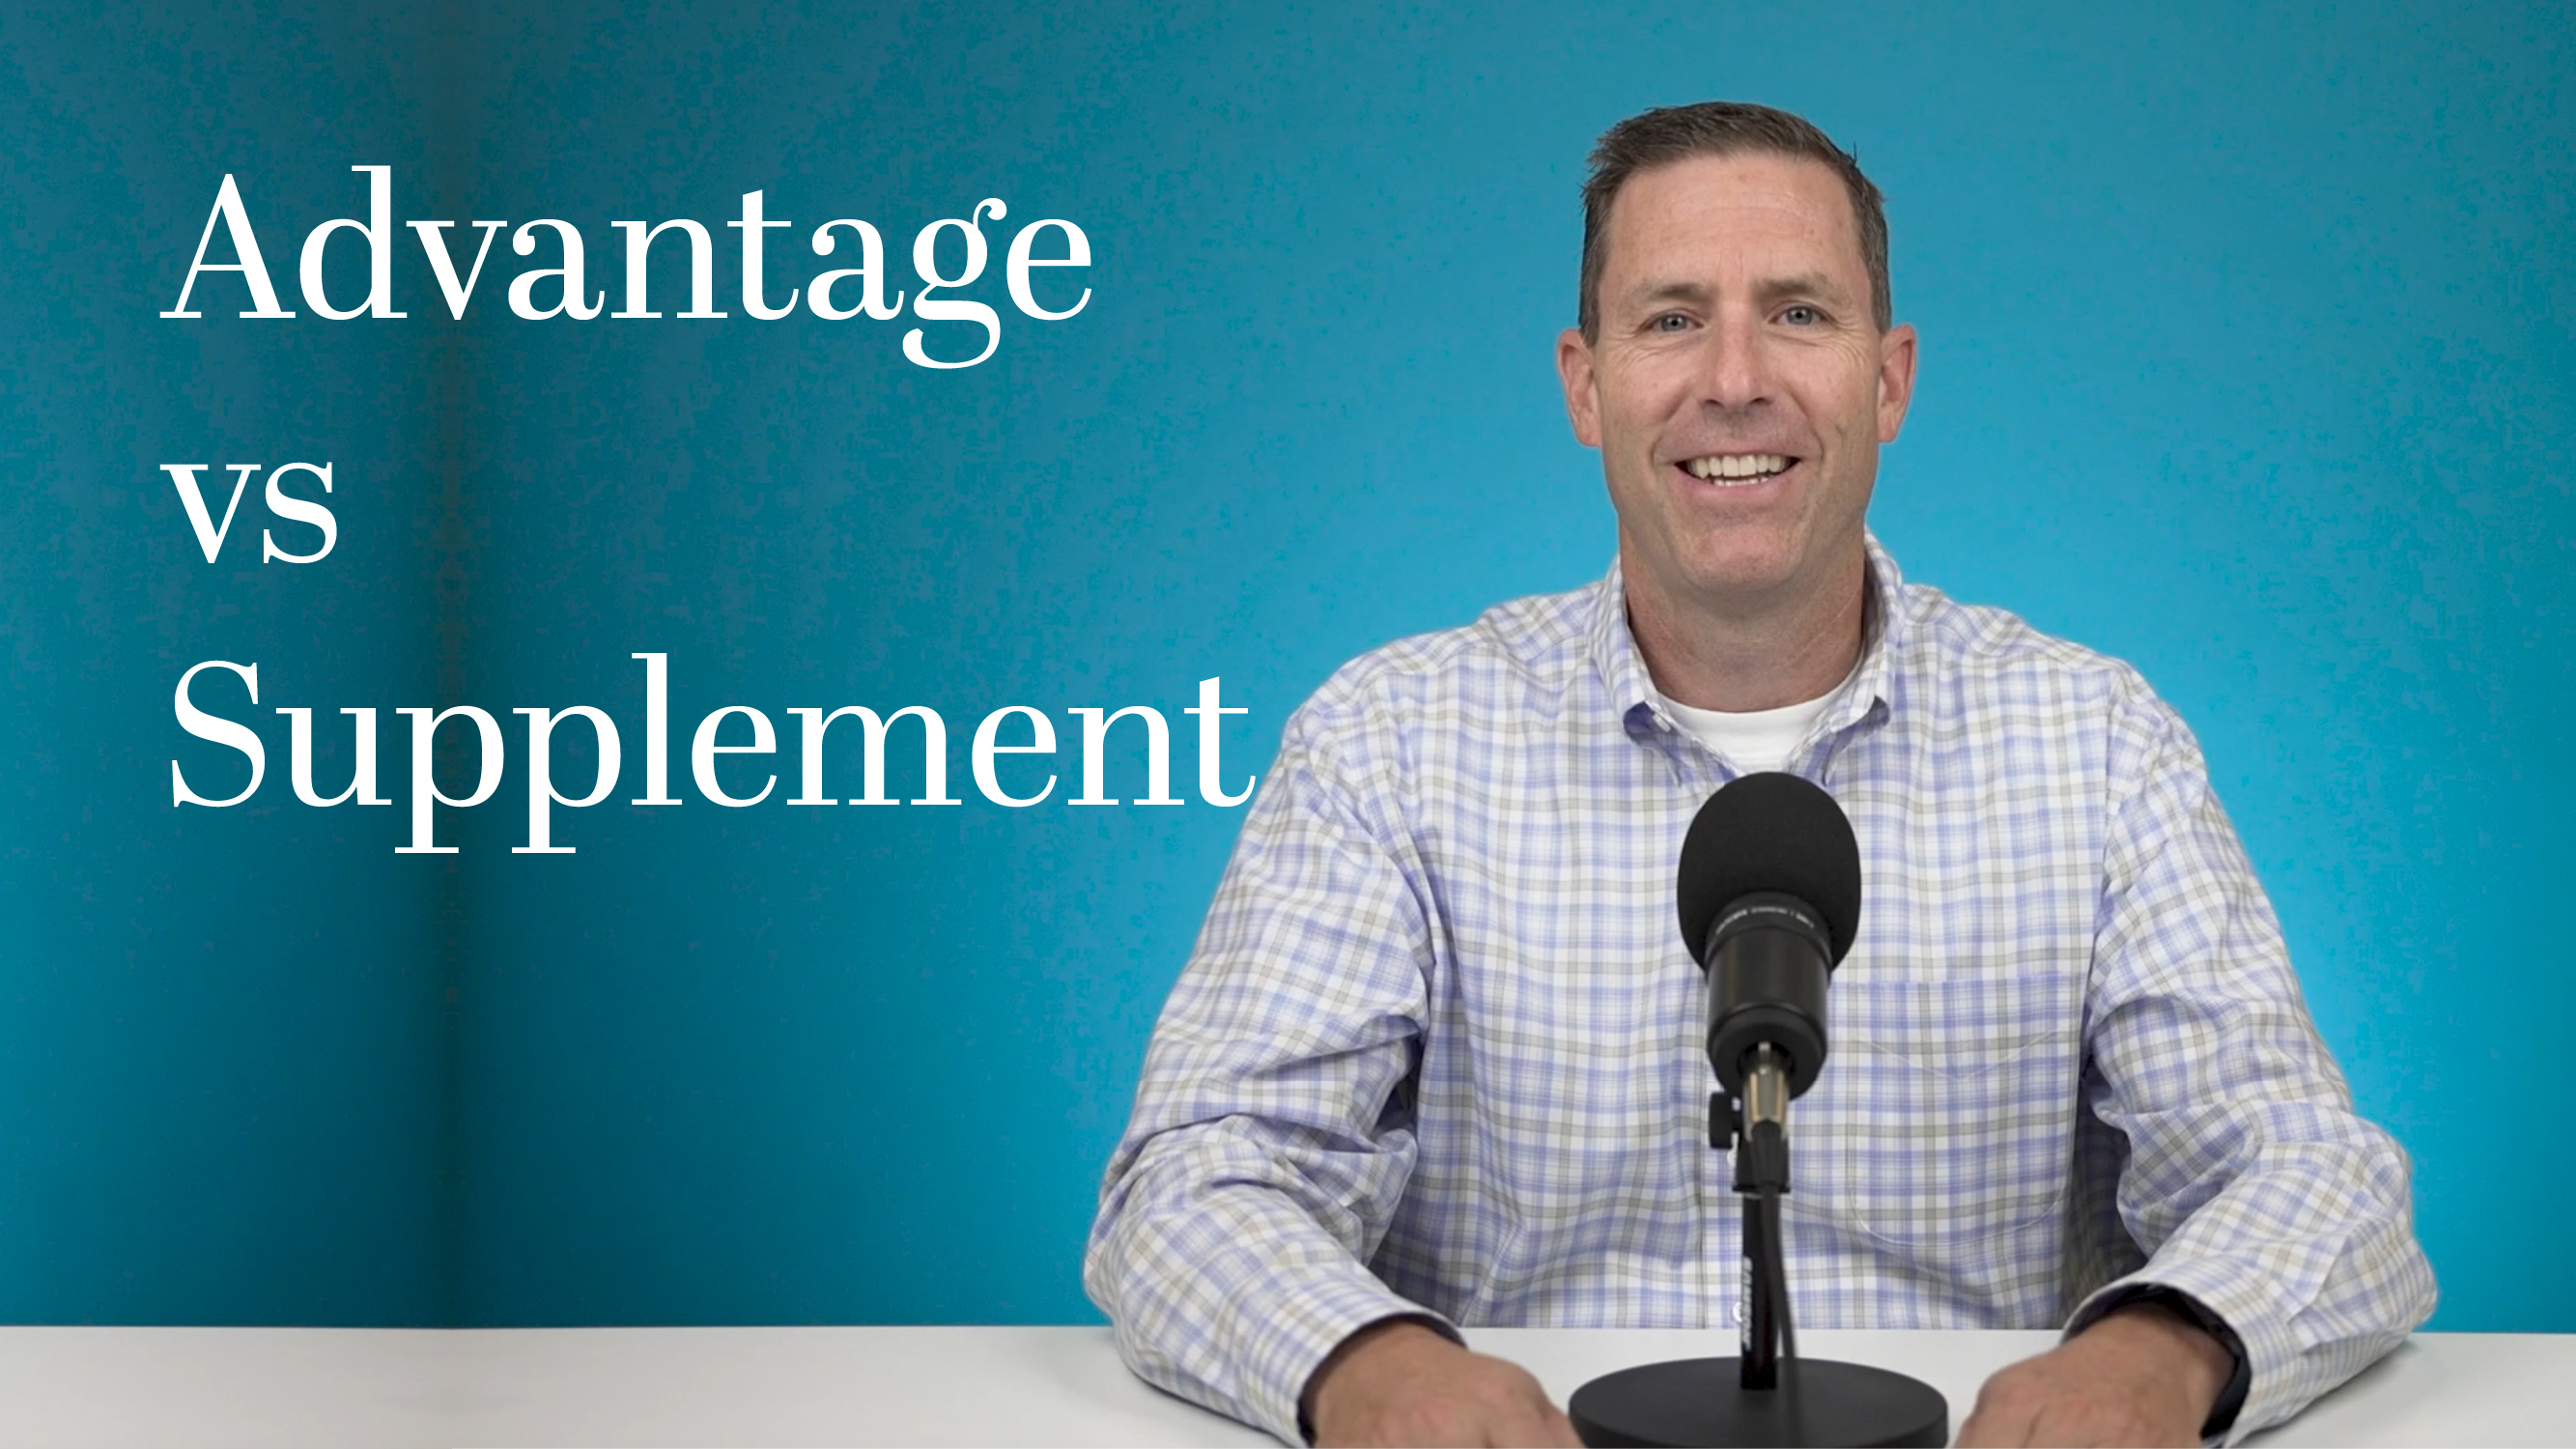 Advantage vs Supplement